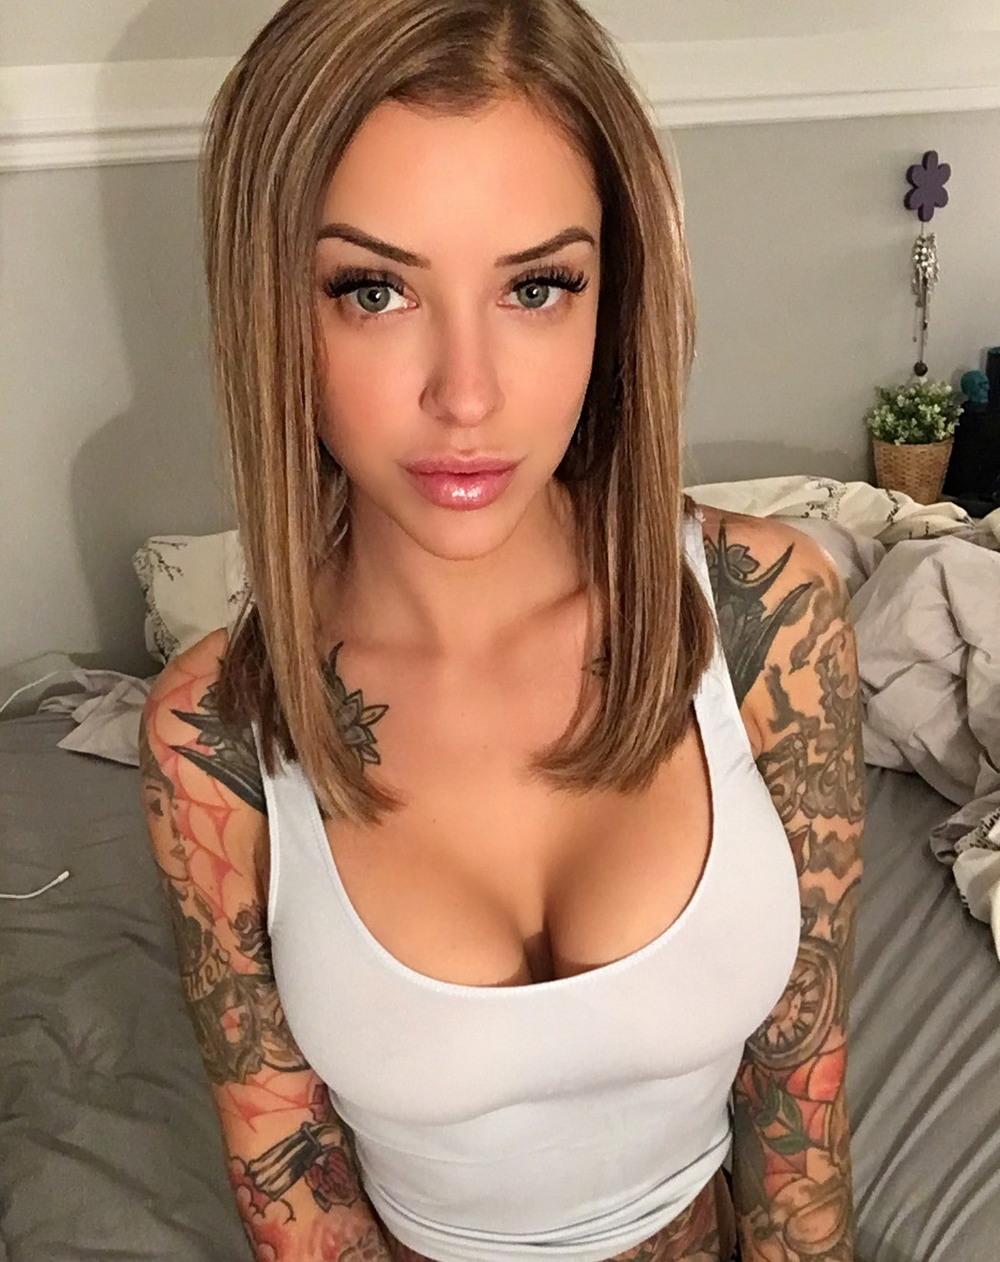 Bangbus Threesome With A Random Girl And A Pornstar Rachel Starr Calenita